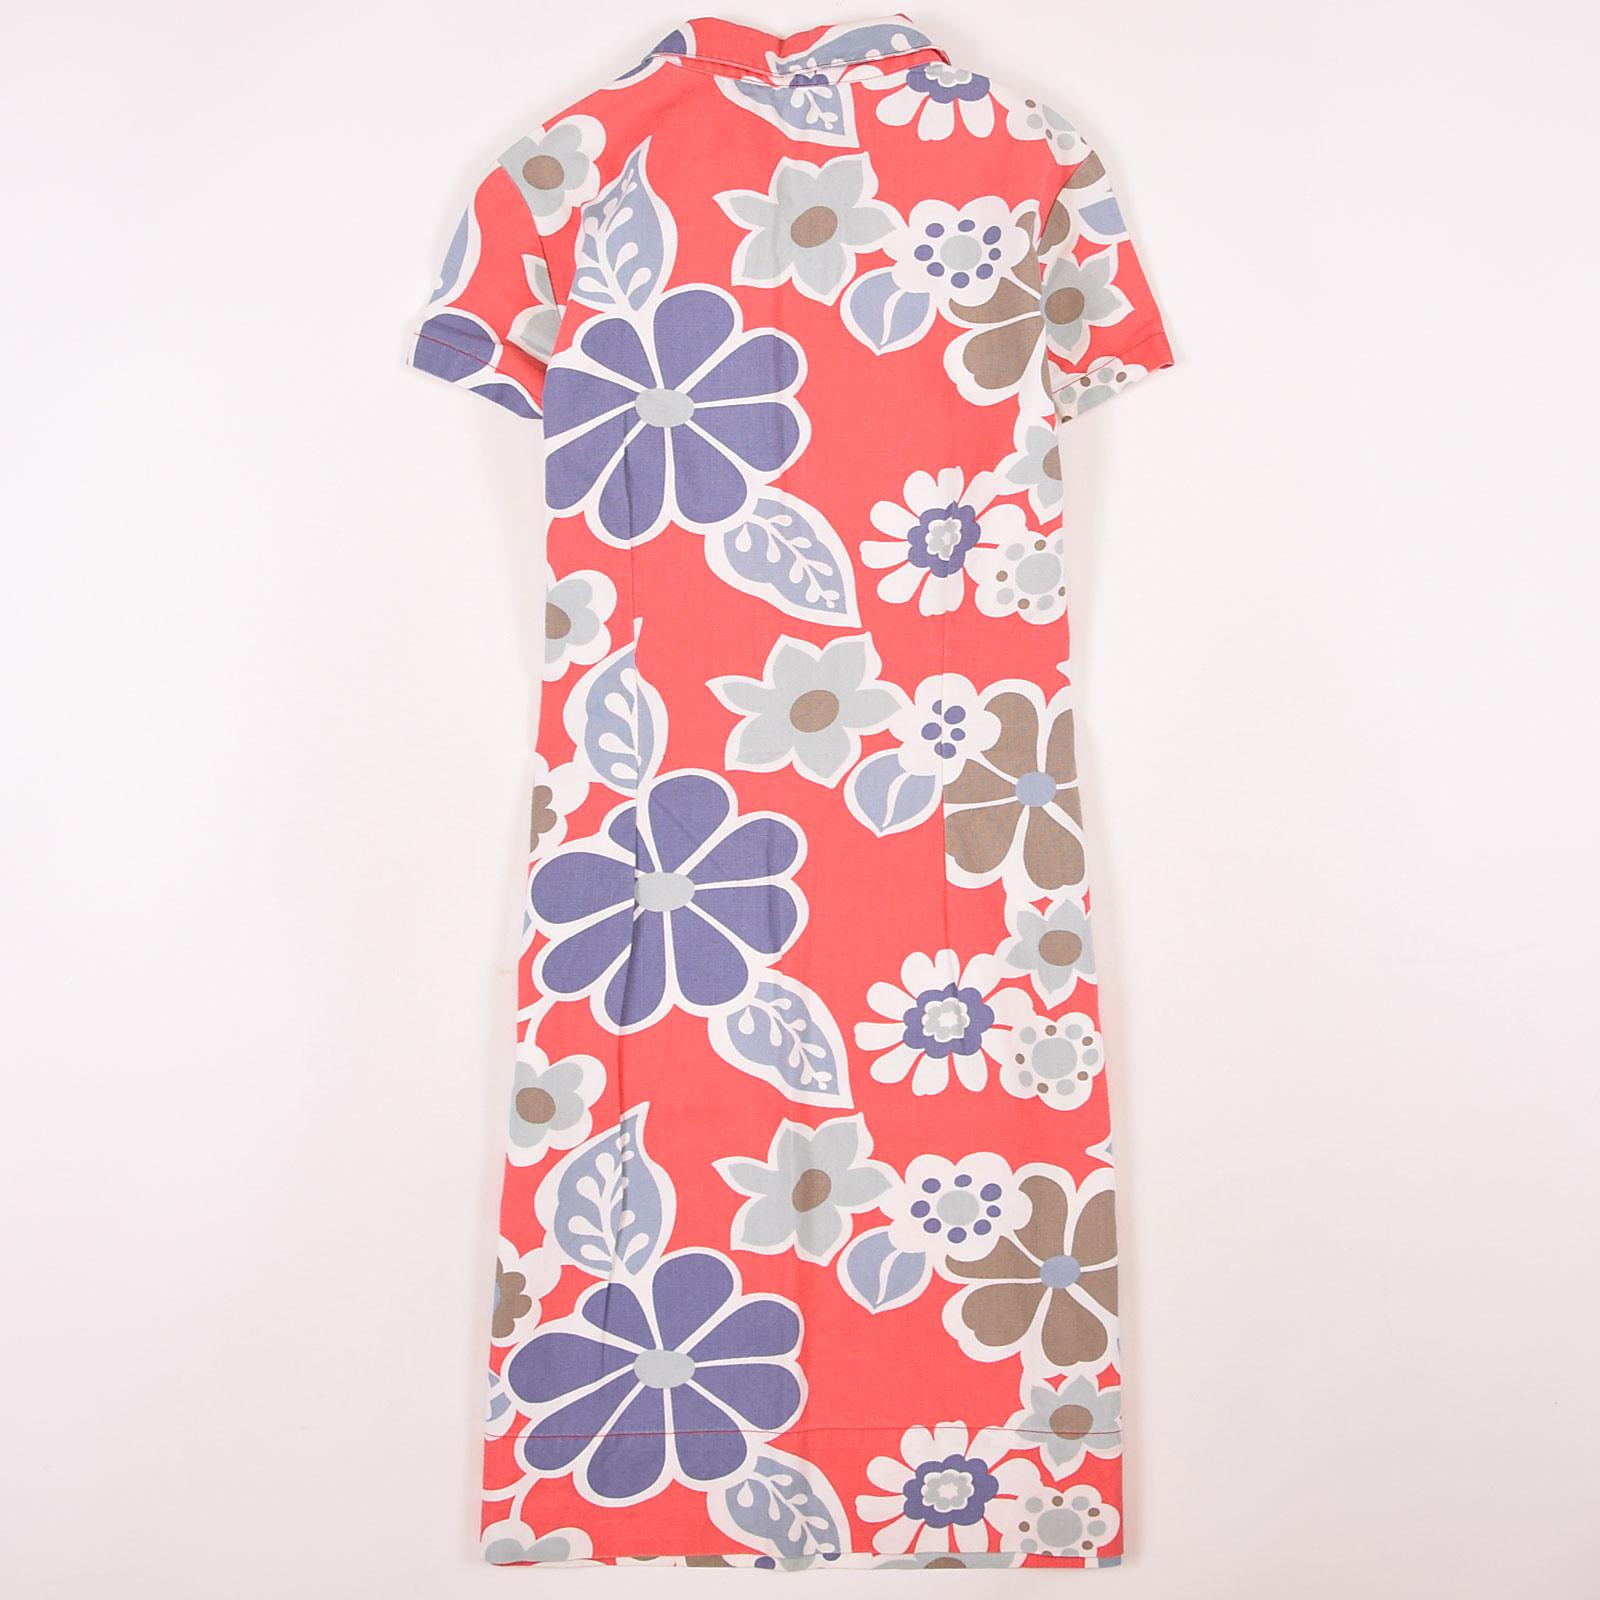 Boden Damen Kleid Dress Hemdblusenkleid Gr10 De 38